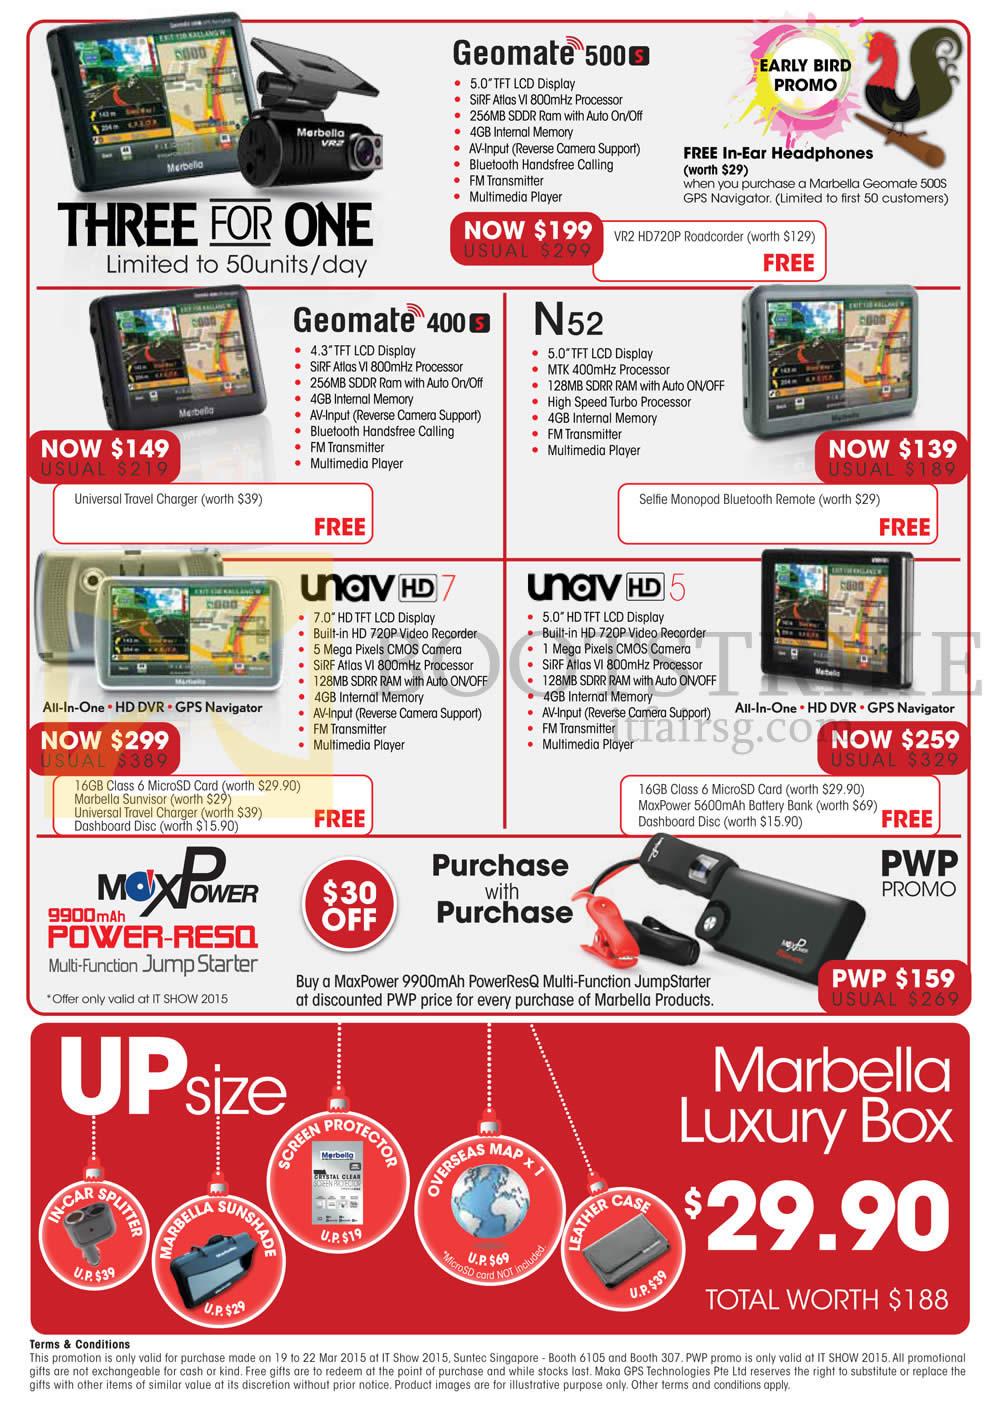 IT SHOW 2015 price list image brochure of Maka GPS Marbella GPS Navigators Geomate 500s, 400s, N52, Unav HD7, HD5, Upsize Luxury Box